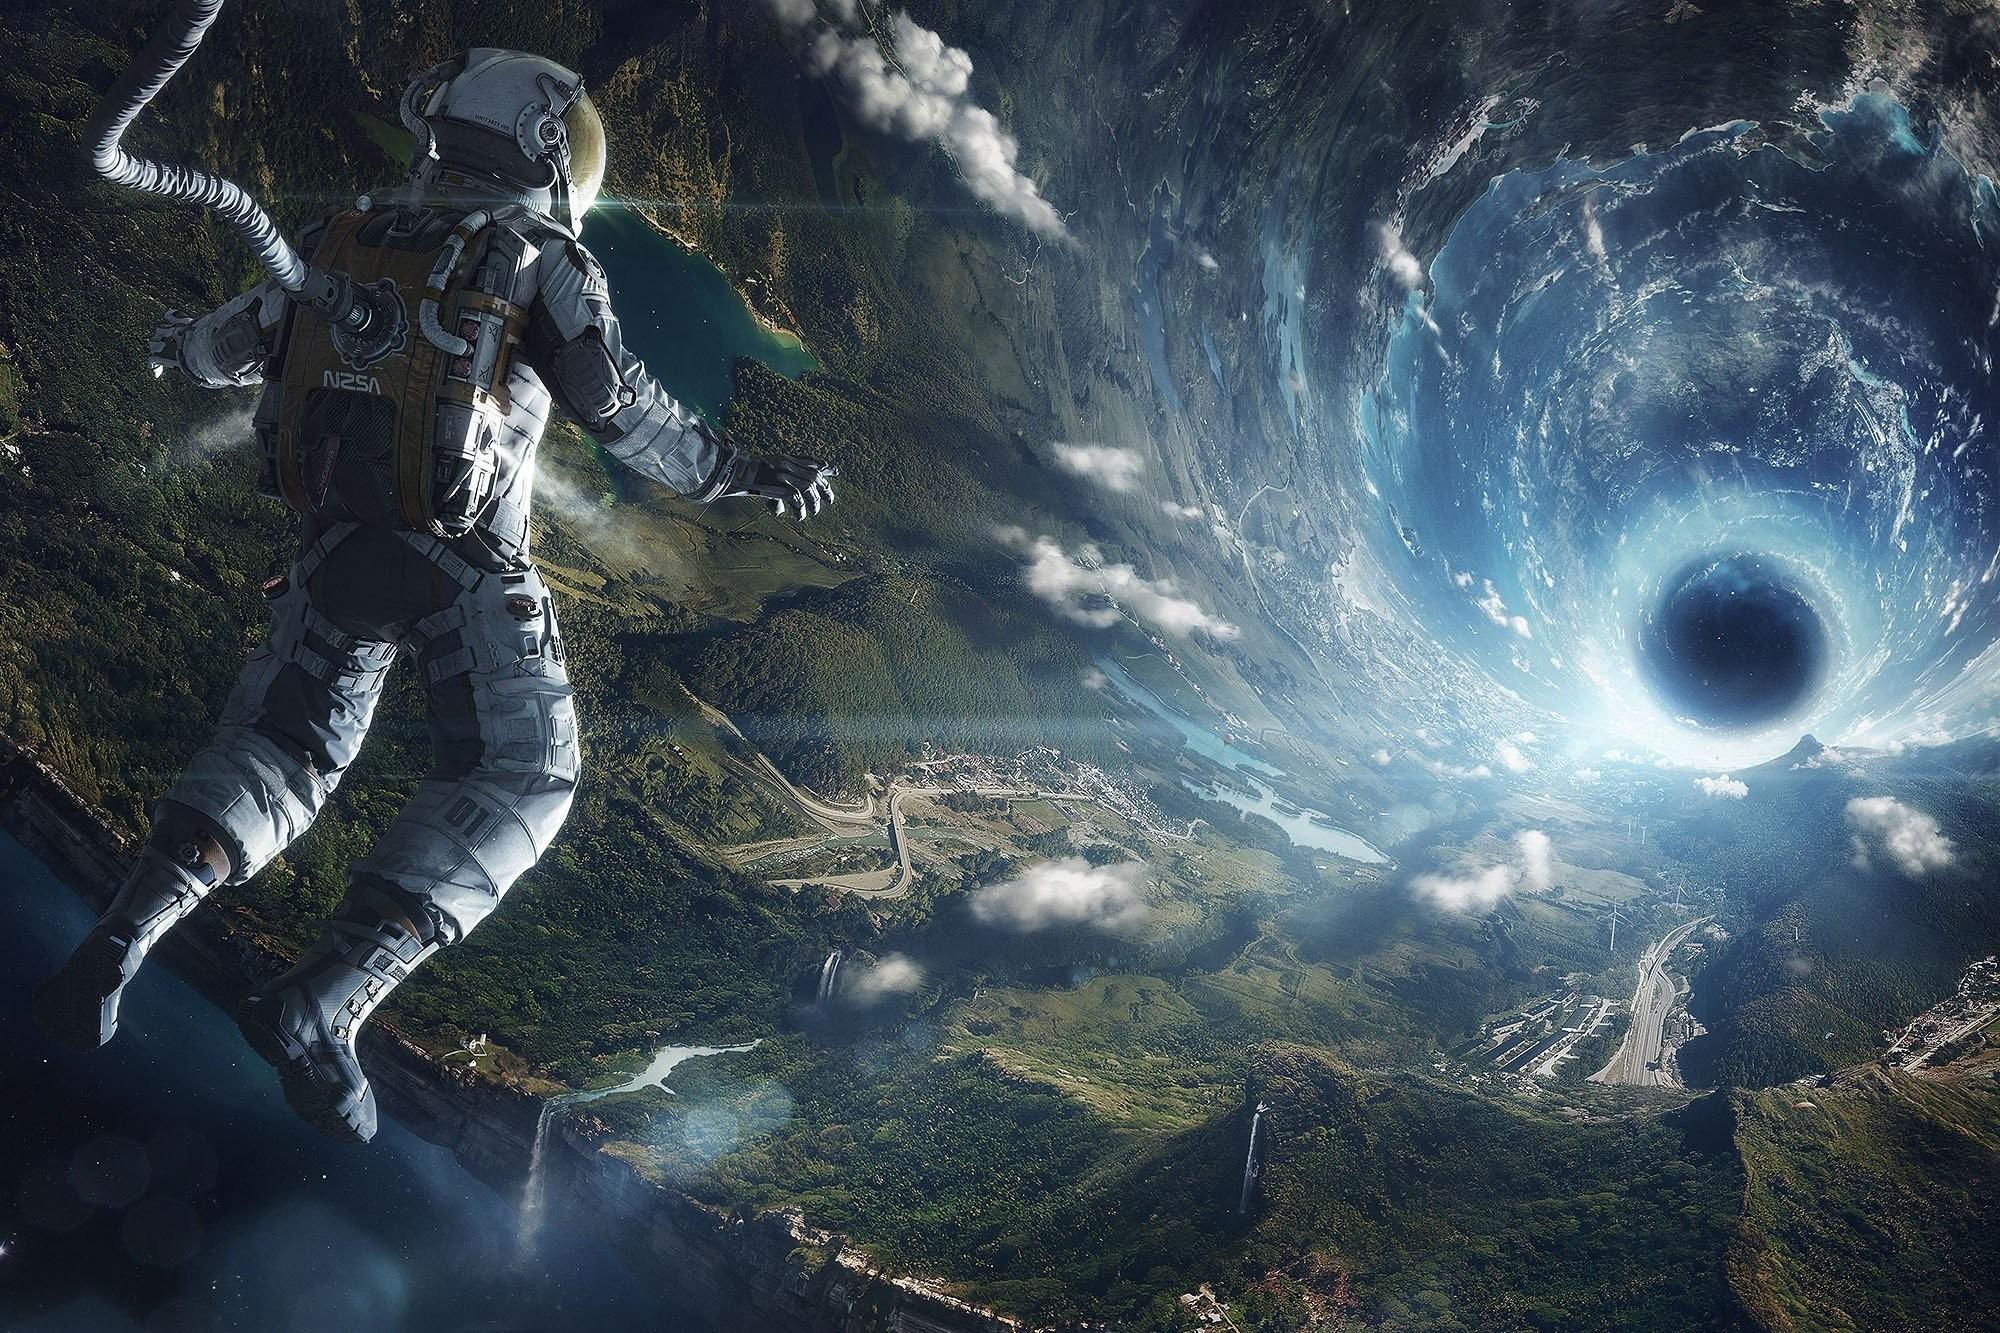 Space Astronauts Fantasy Art